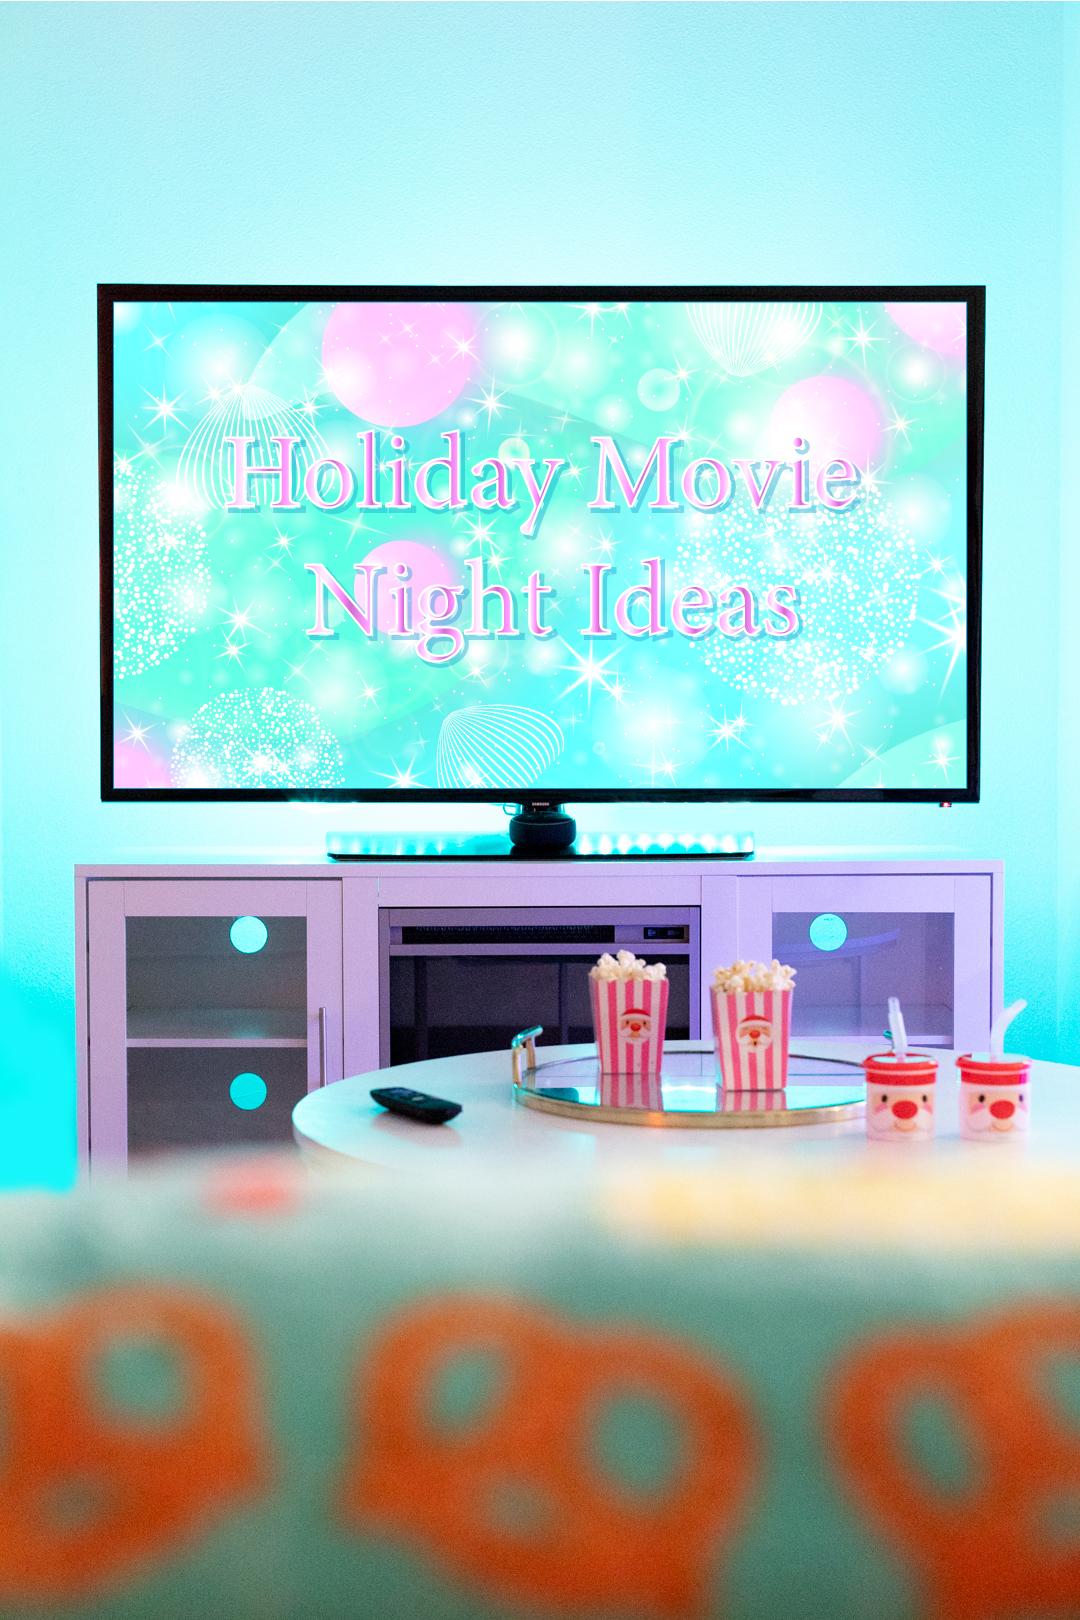 holiday movie night ideas with smart home lighting